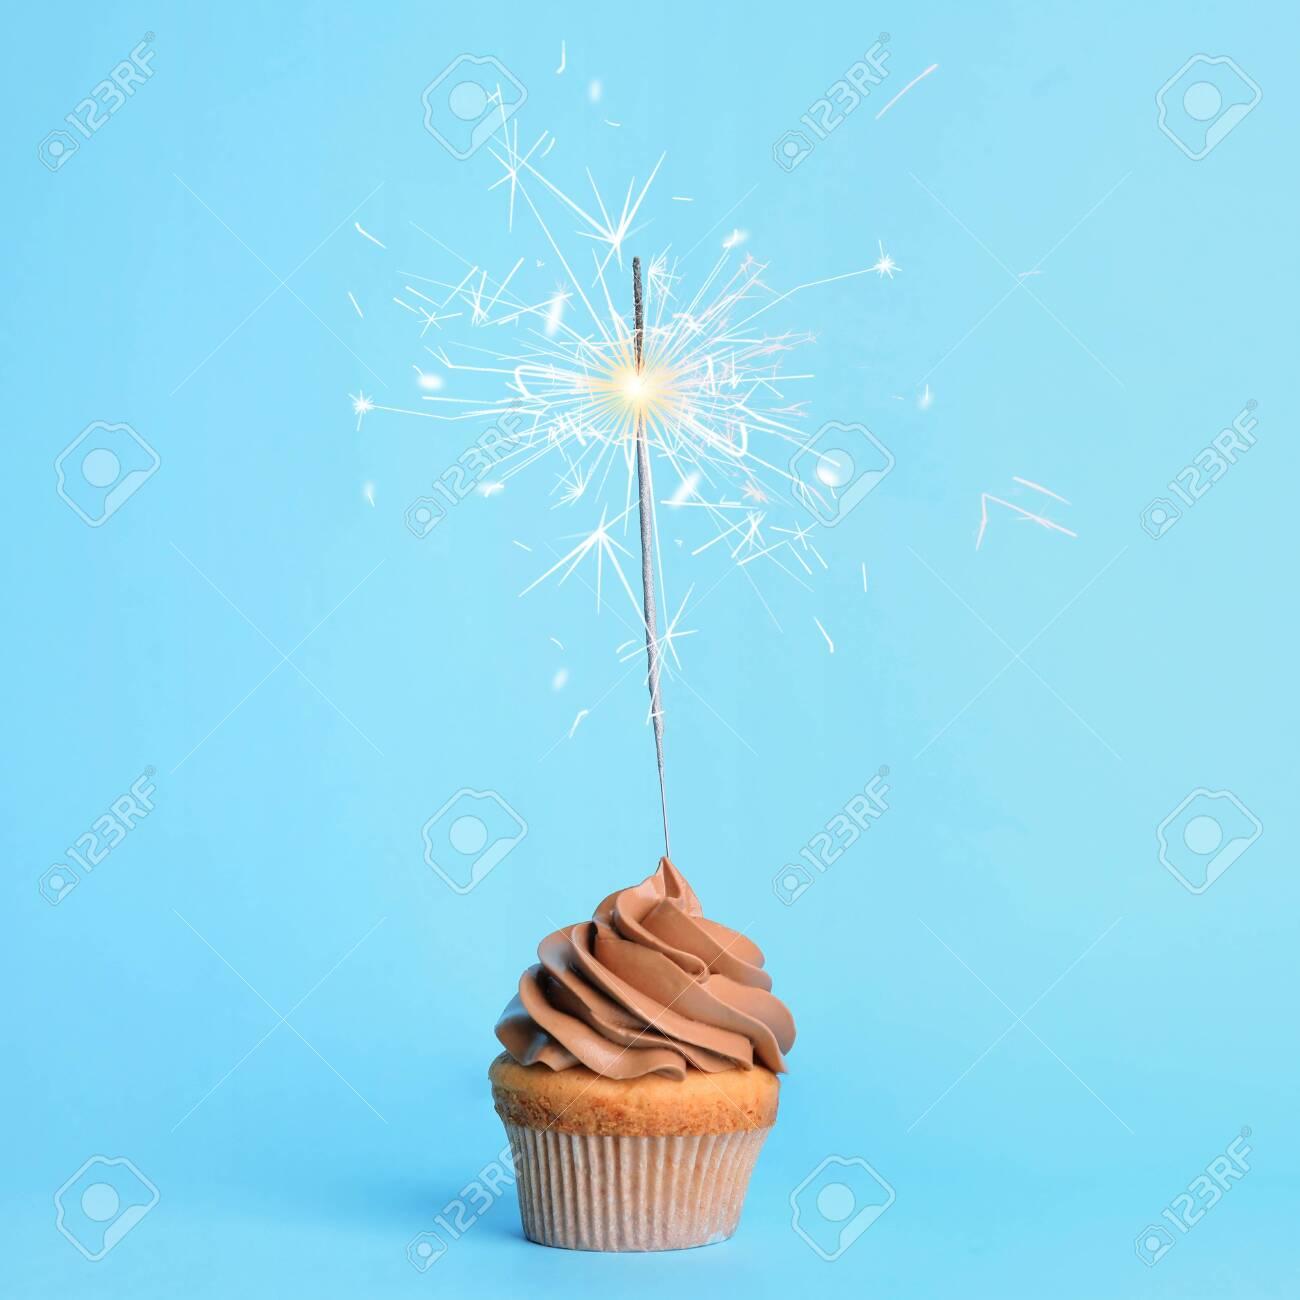 Birthday cupcake with sparkler on light blue background - 142770122